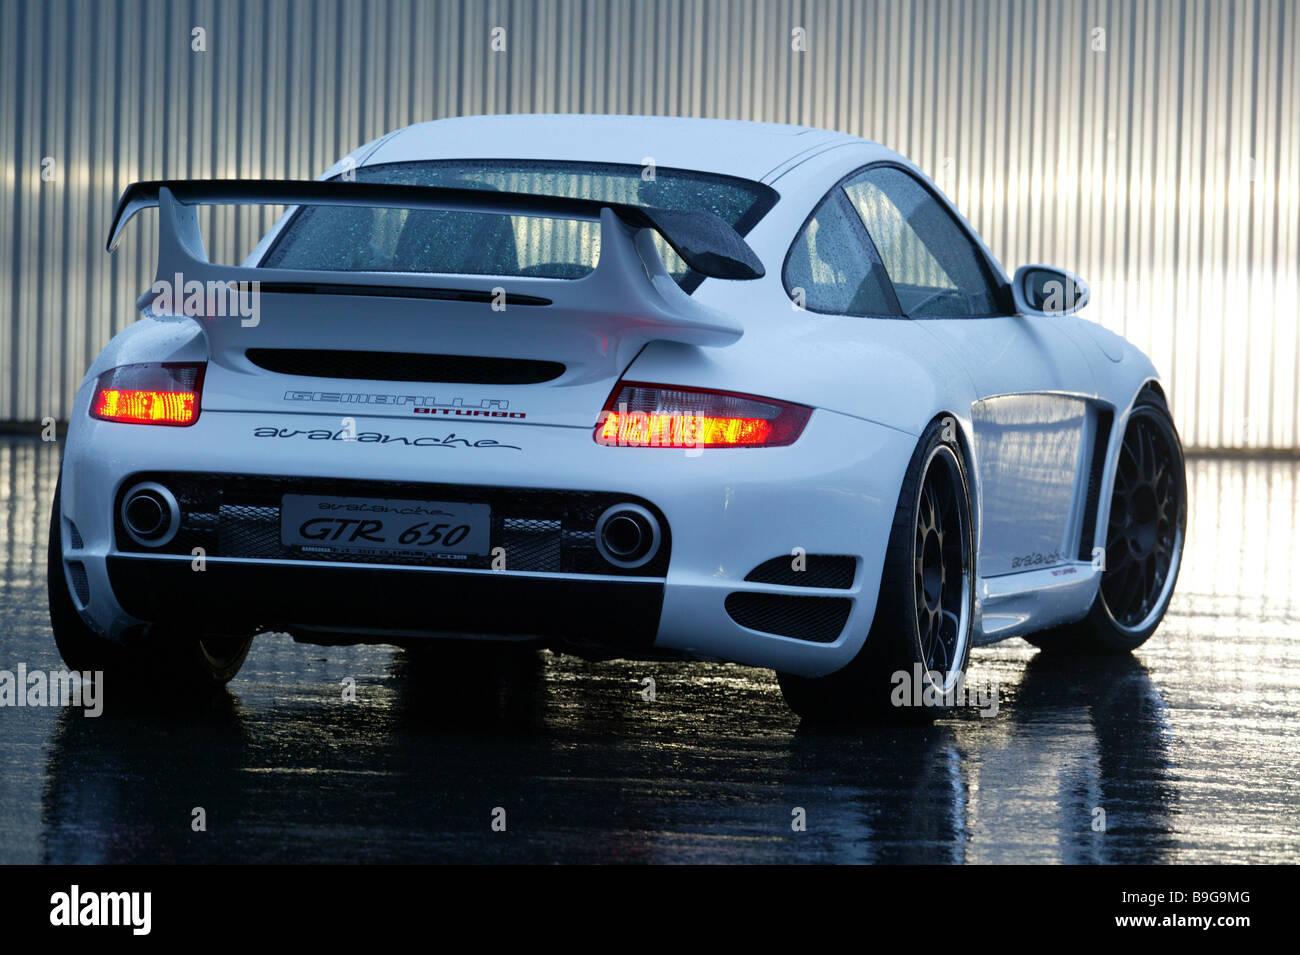 Porsche Gemballa Knows Backview Rain Twilight Series Vehicle Car